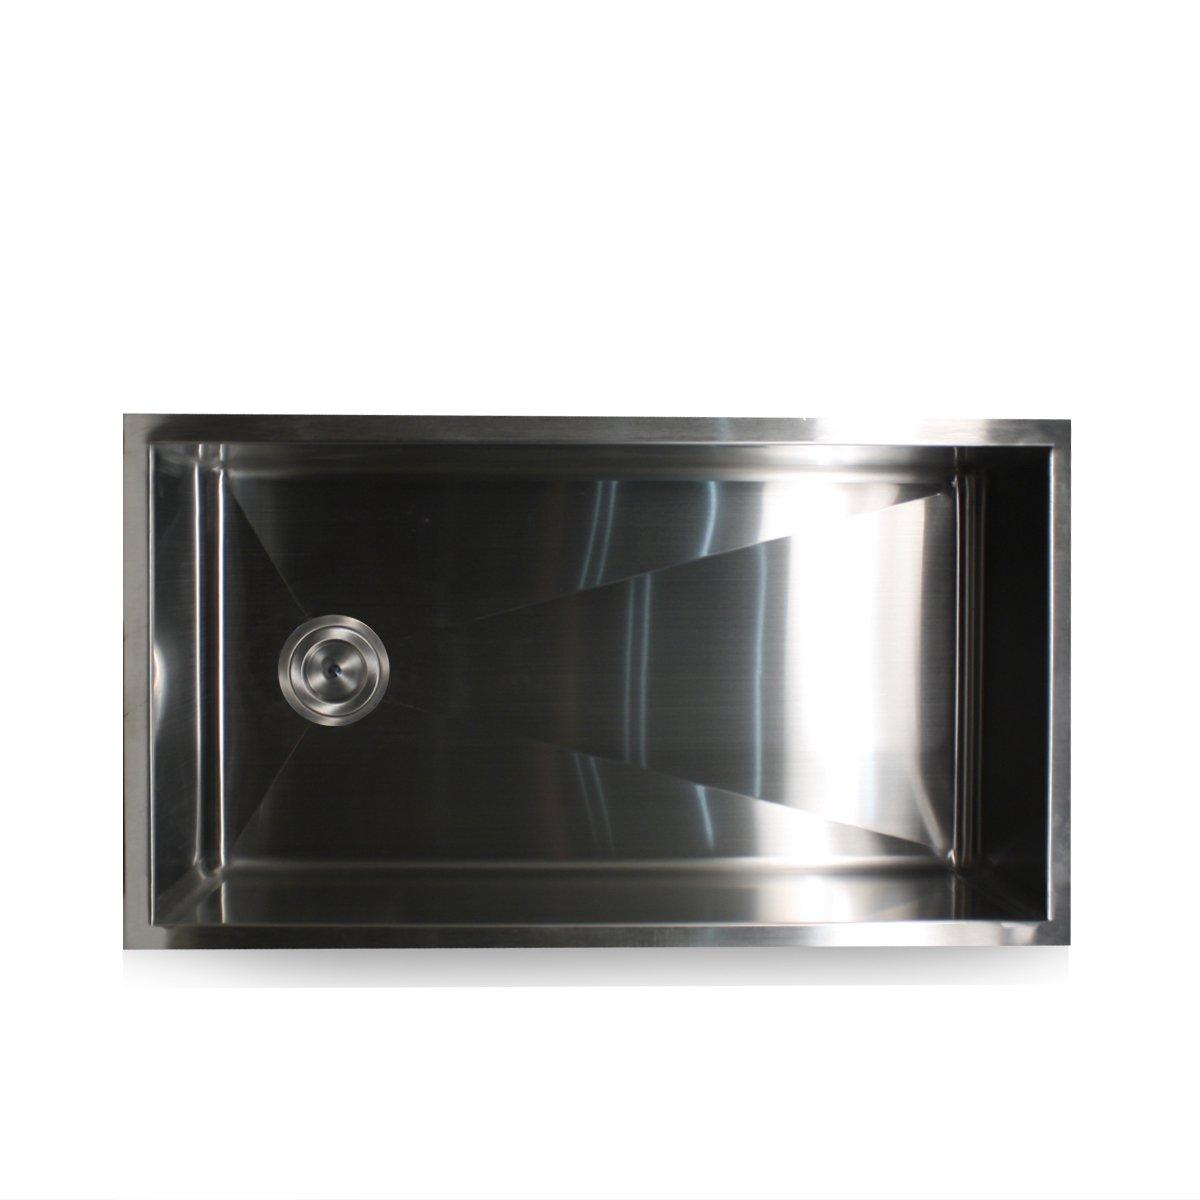 Nantucket Sinks ZR3218 32-Inch Pro Series Single Bowl Undermount ...